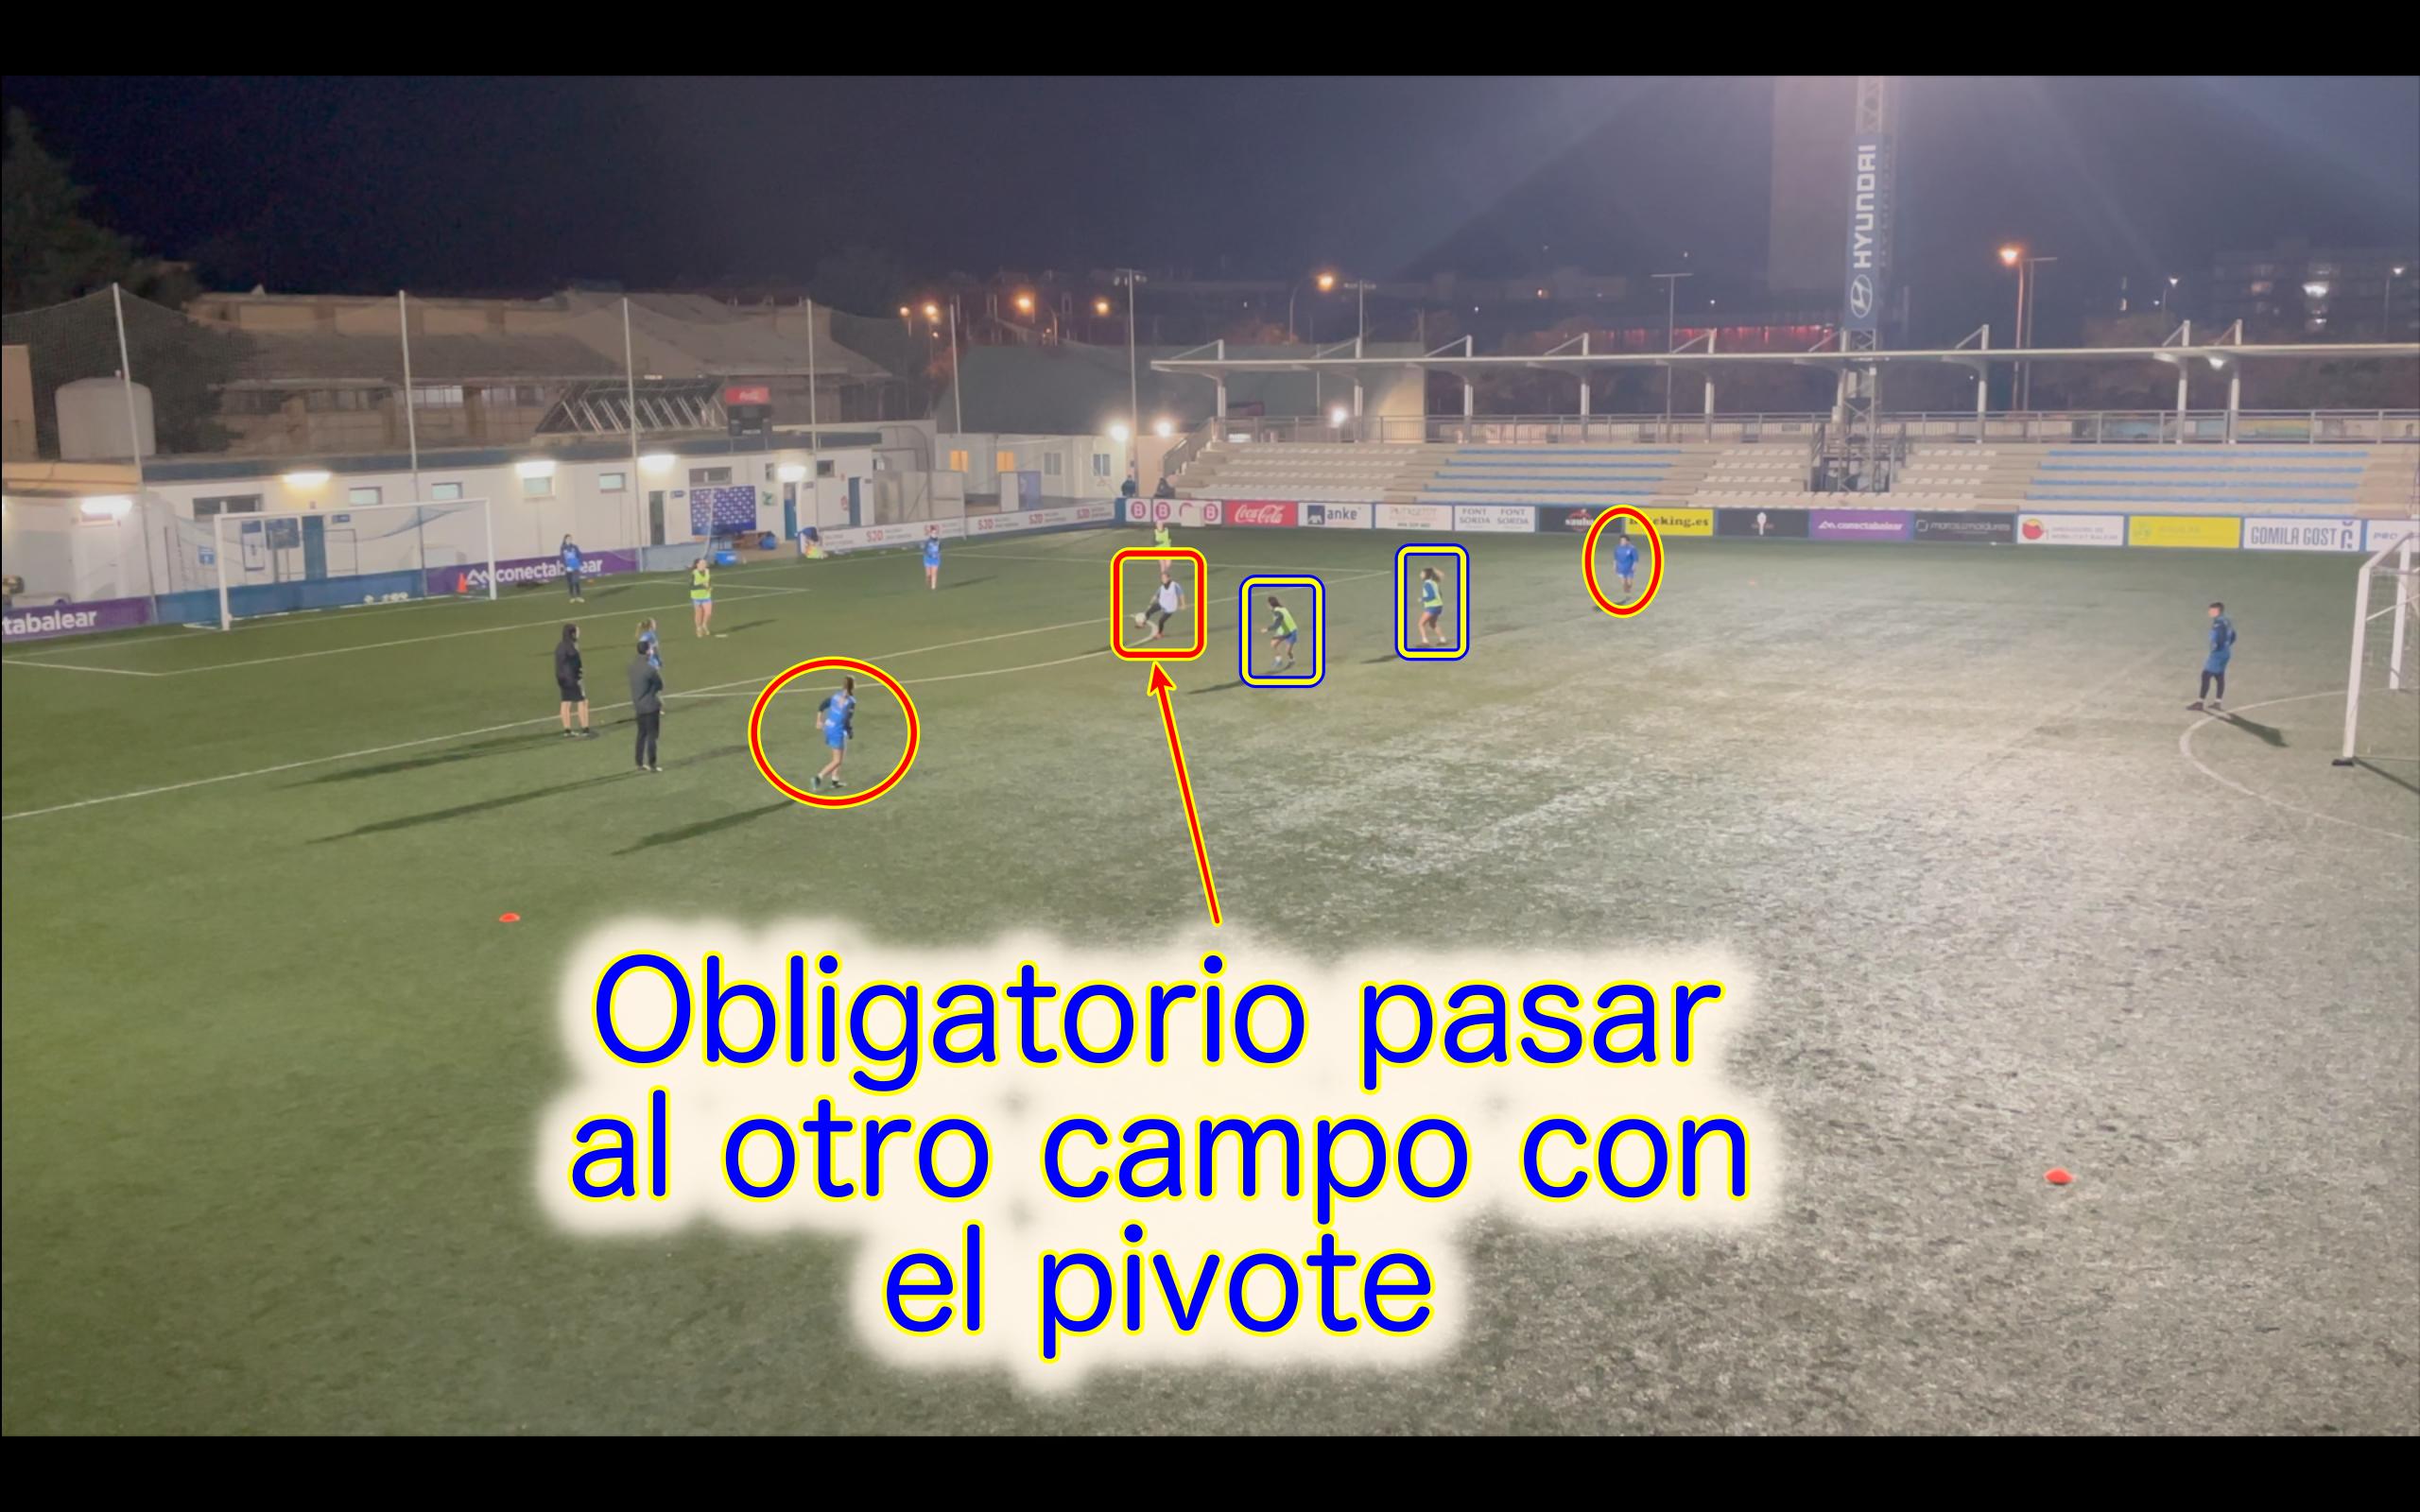 Situación Txema Expósito. Ejercicio de entrenamiento fútbol. Salida de balón. Atlético Baleares femenino.